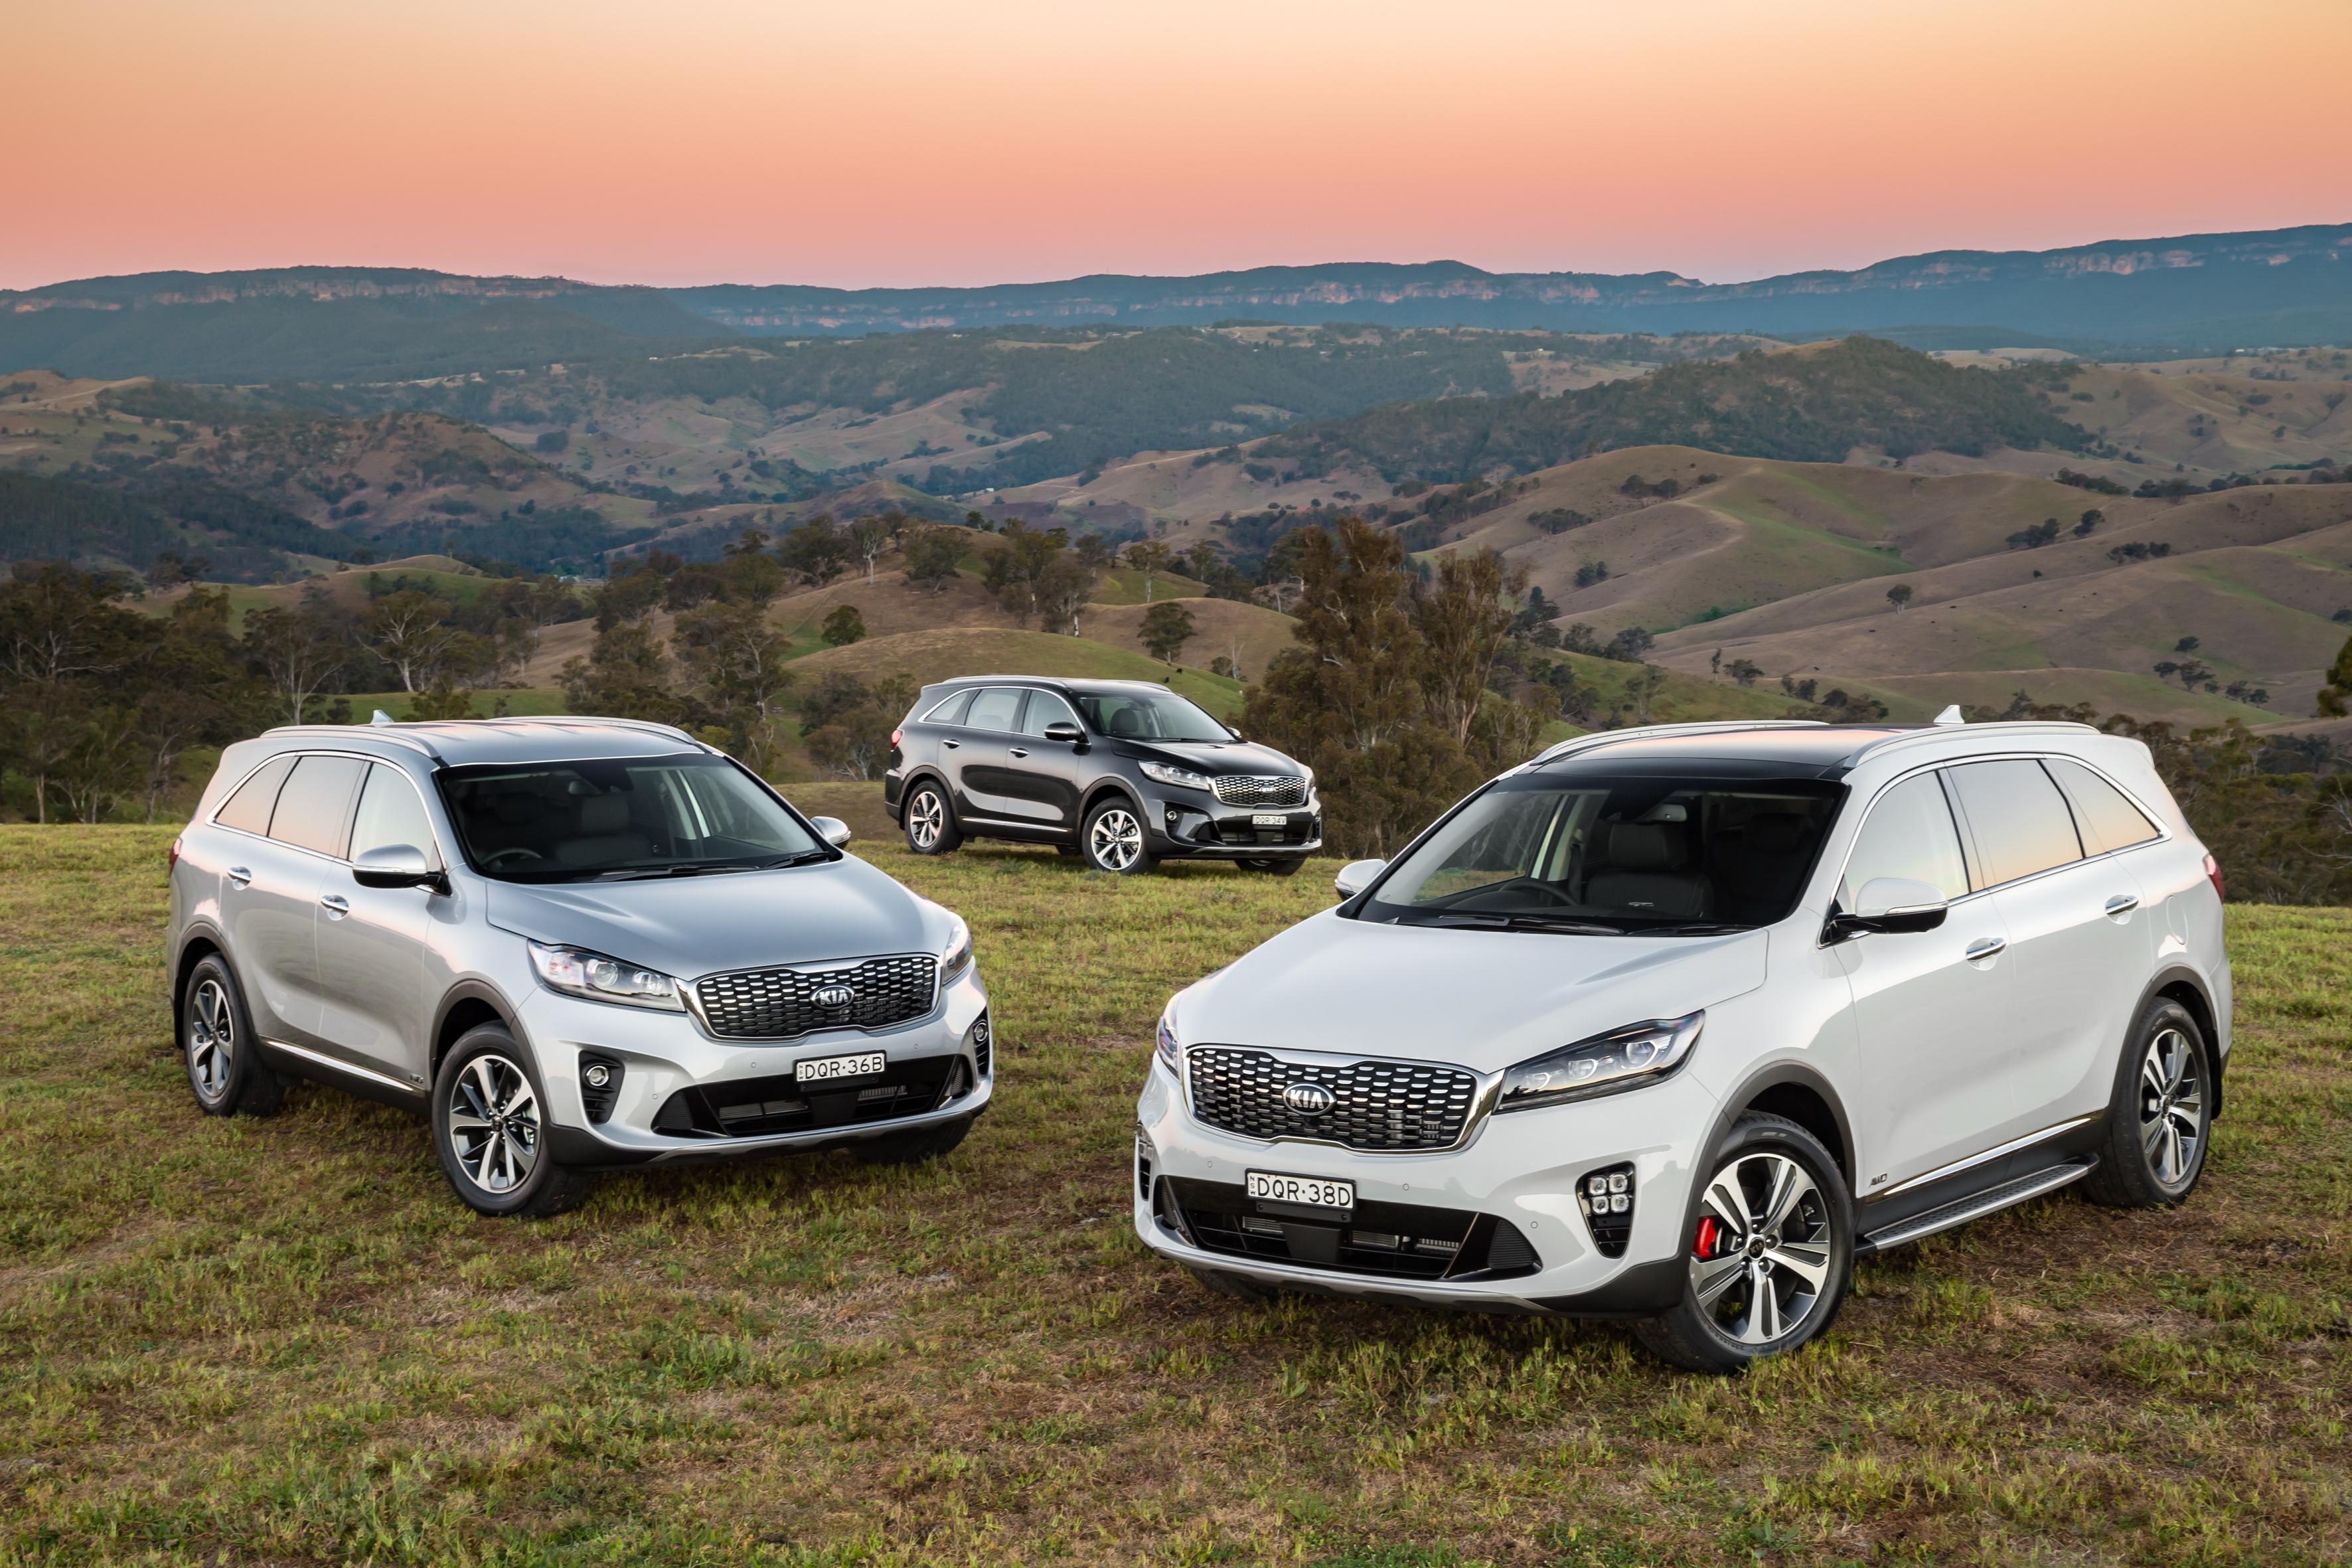 2018 Kia Sorento first drive review